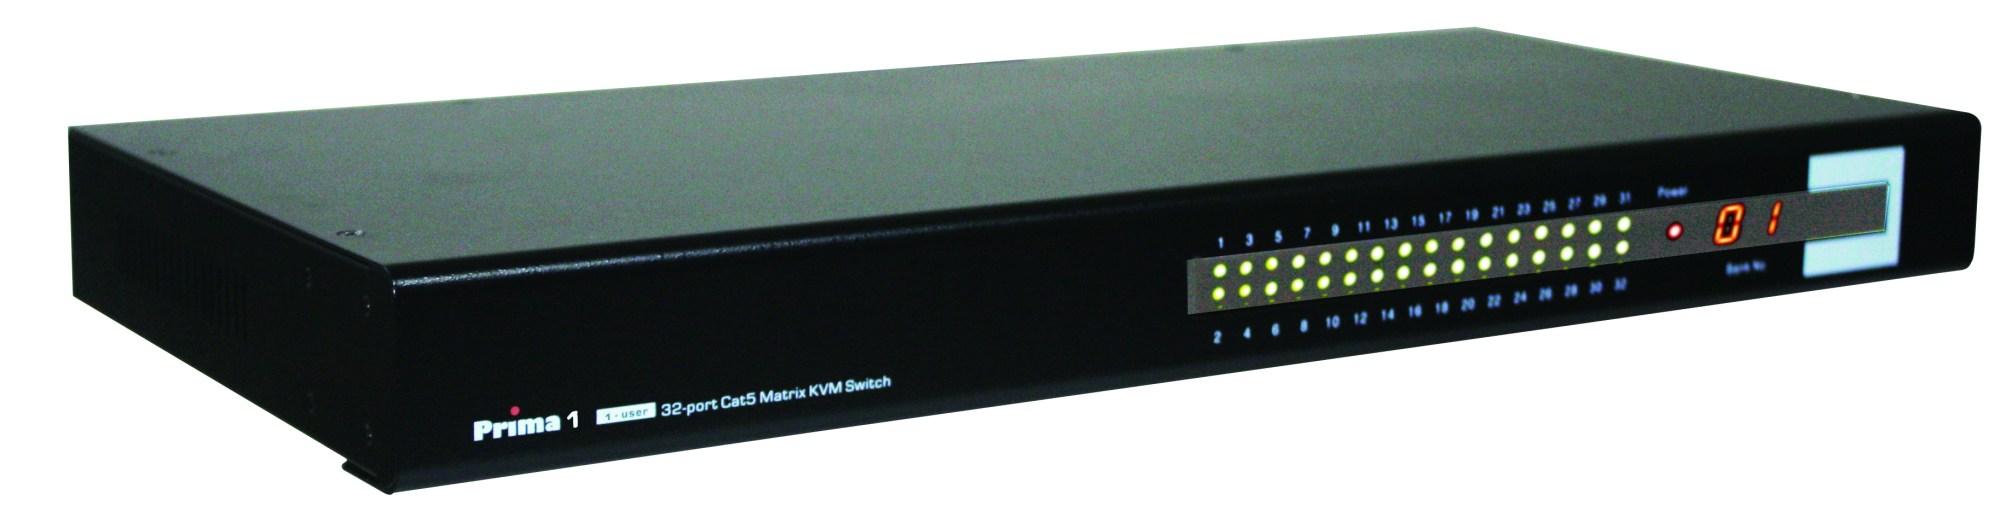 hight resolution of uniclass pmc 0132 32 port cat 5 kvm switch w osd